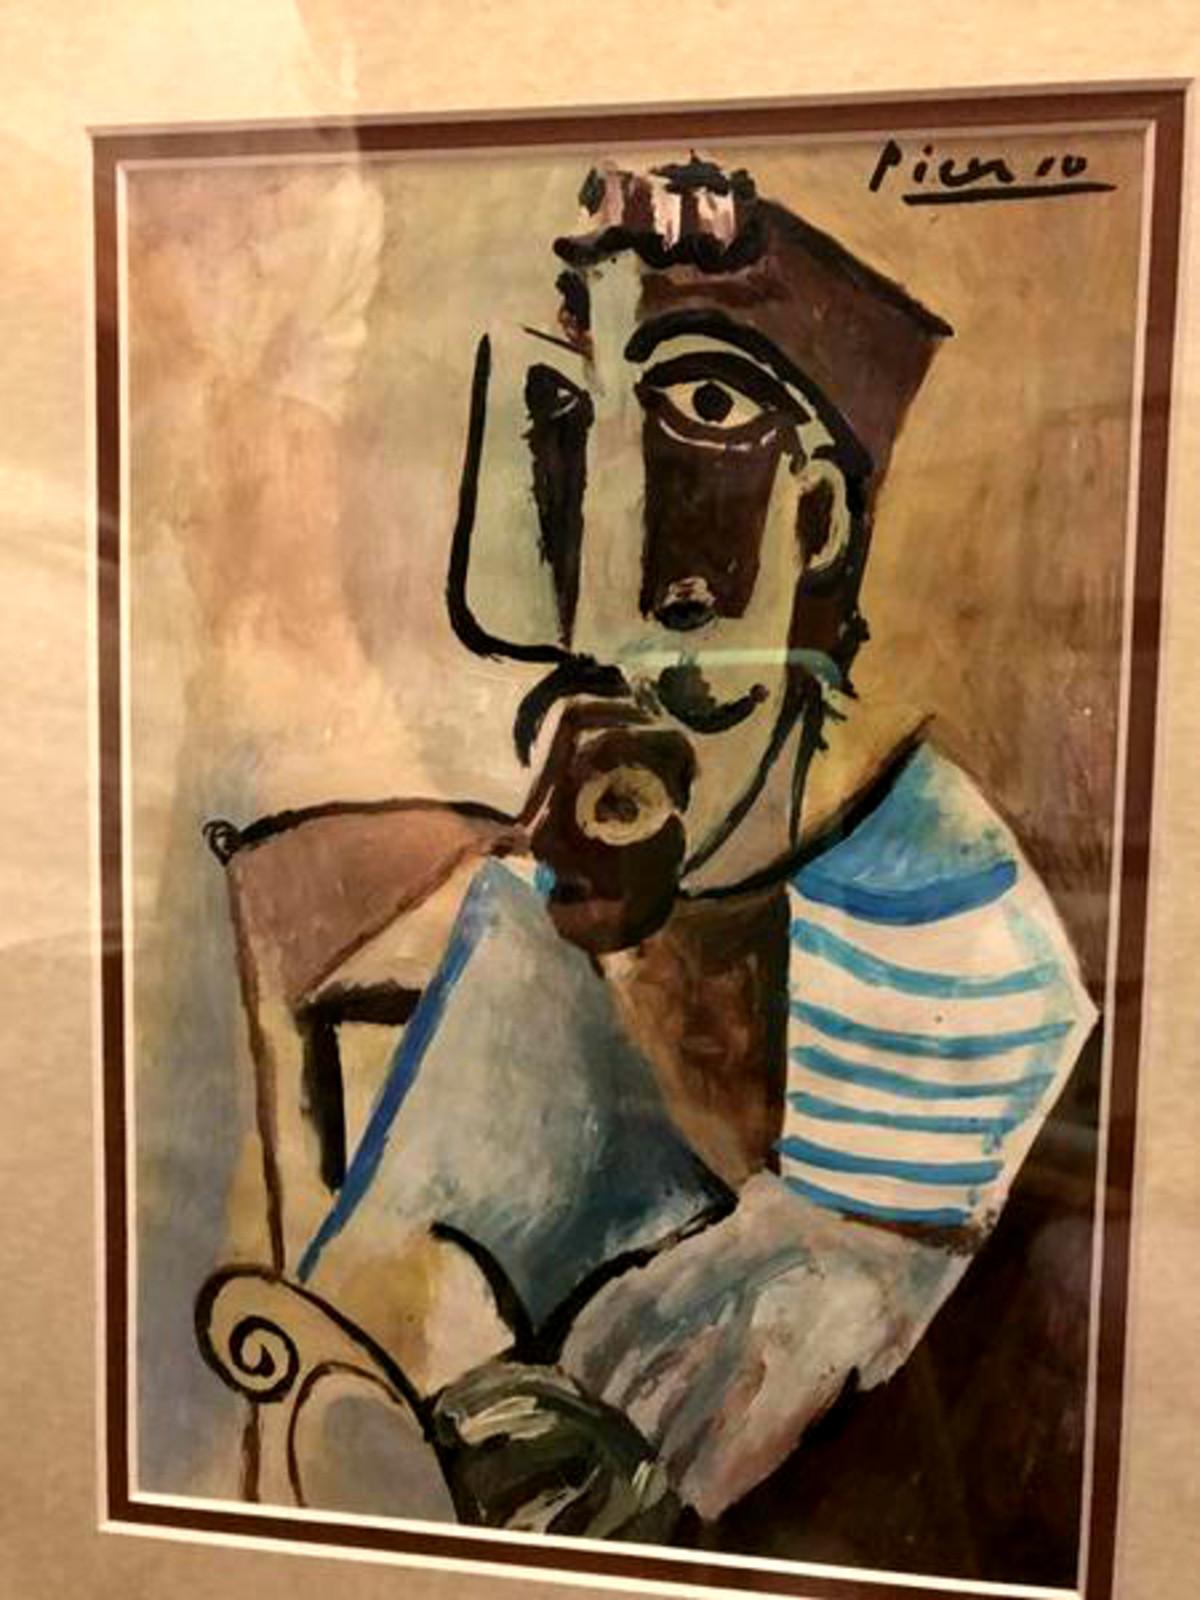 Houston Picasso painting for sale Nextdoor ad